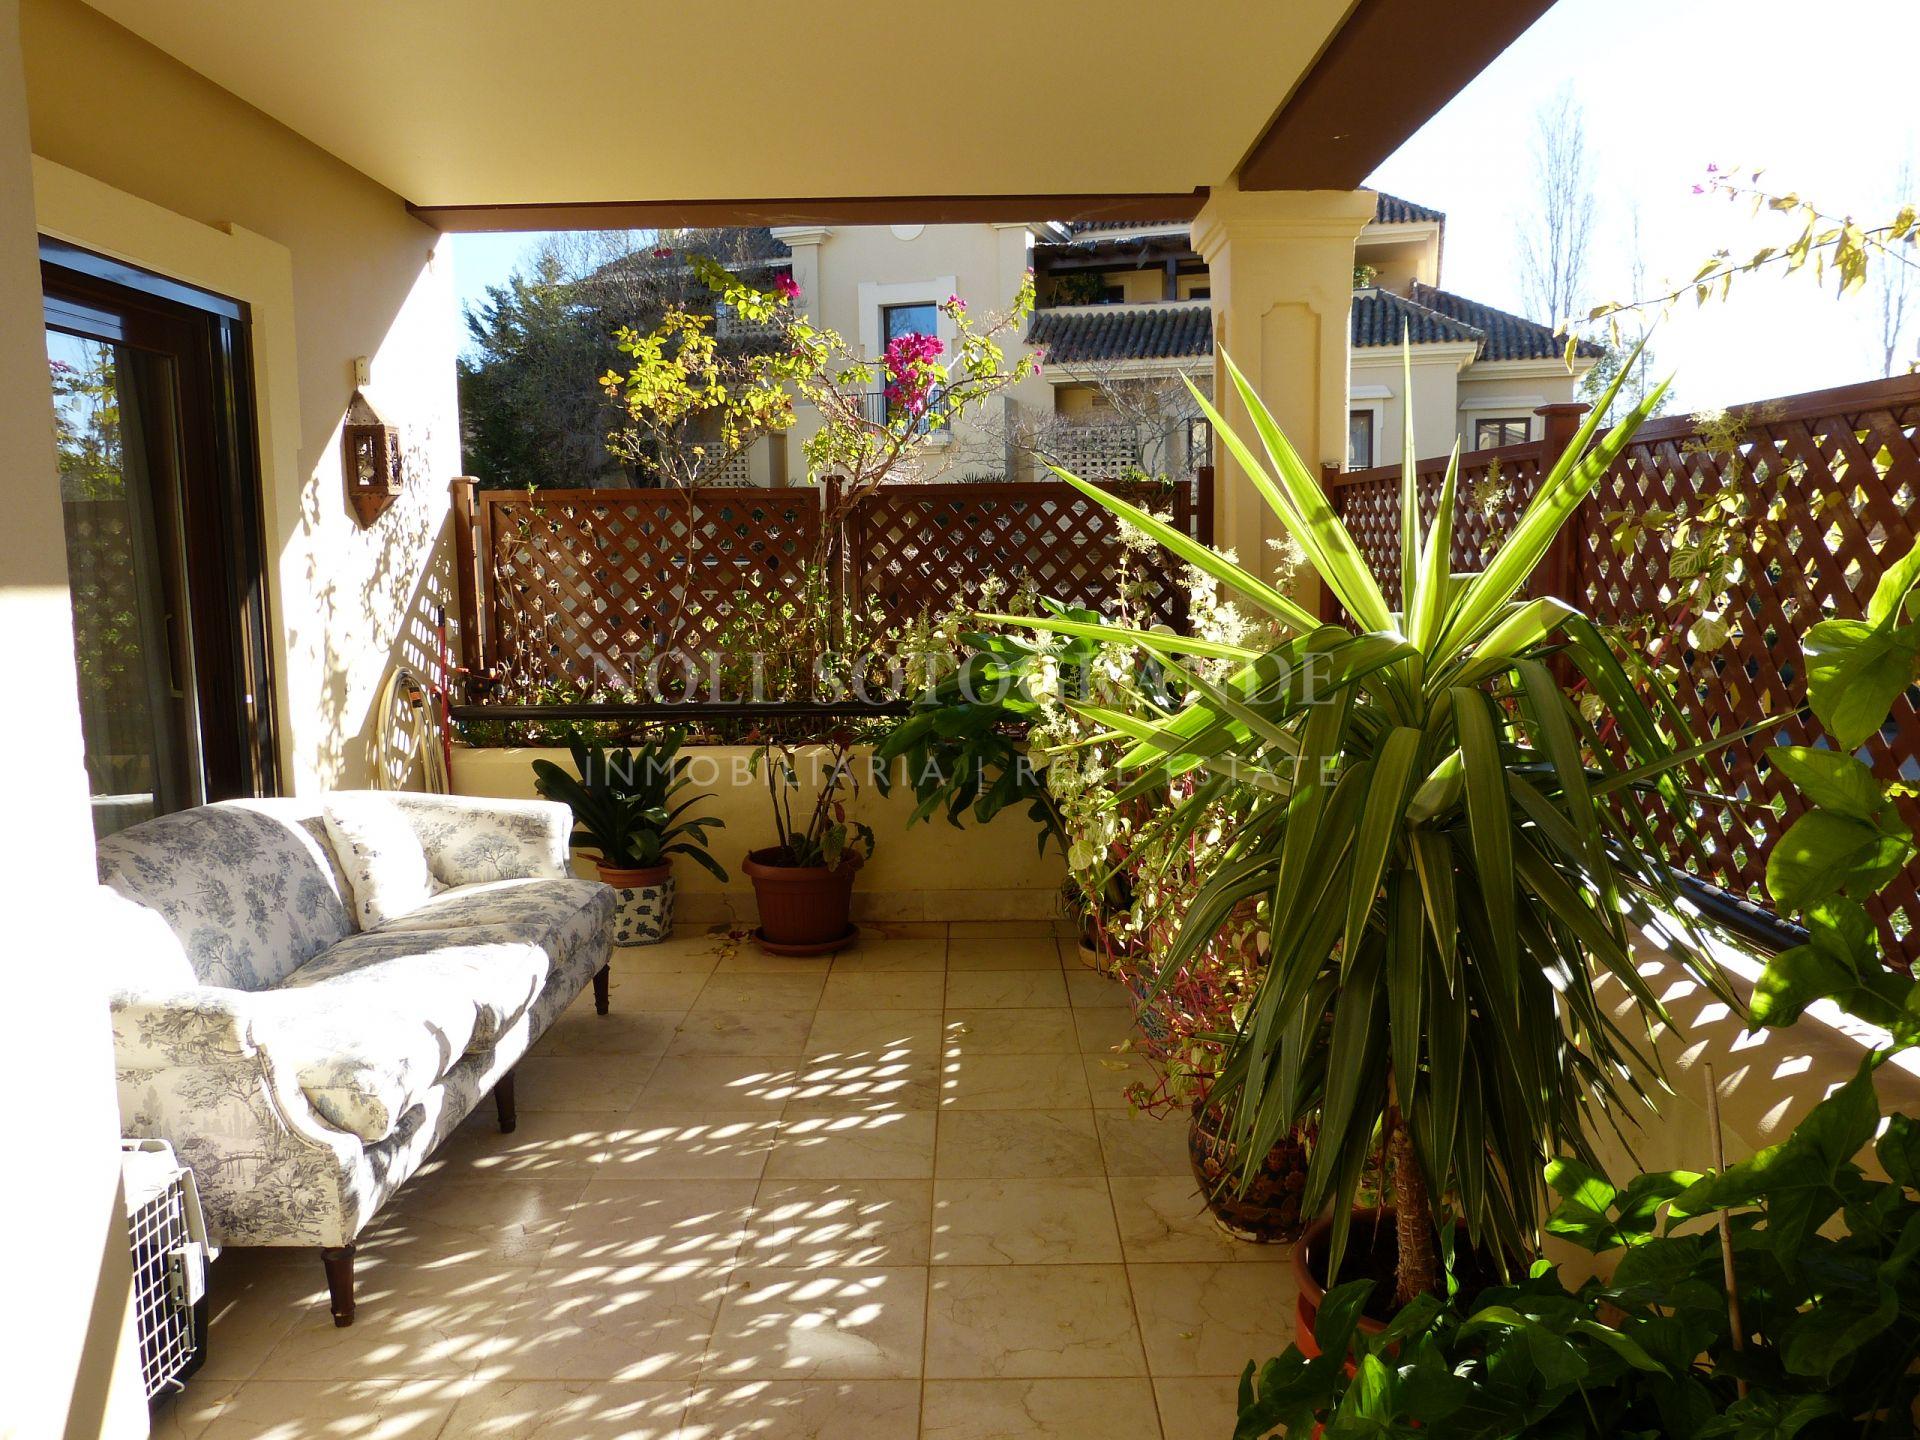 Sotogrande, Two bedroom Valgrande apartment for sale